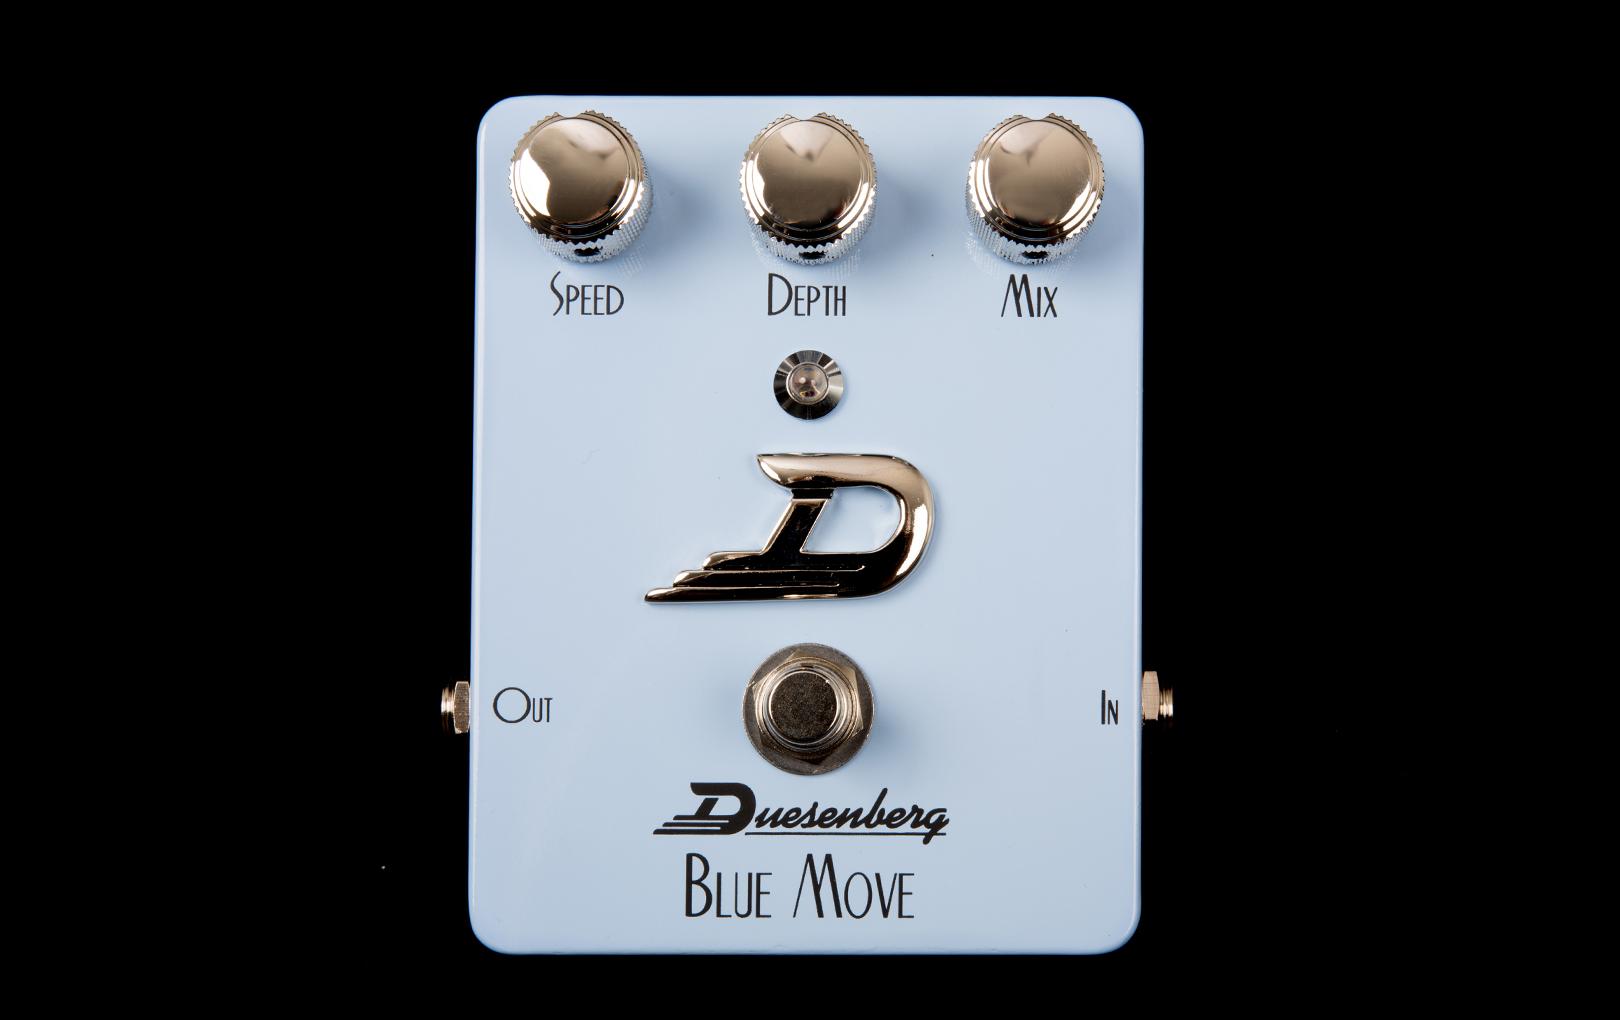 bluemove_detail1